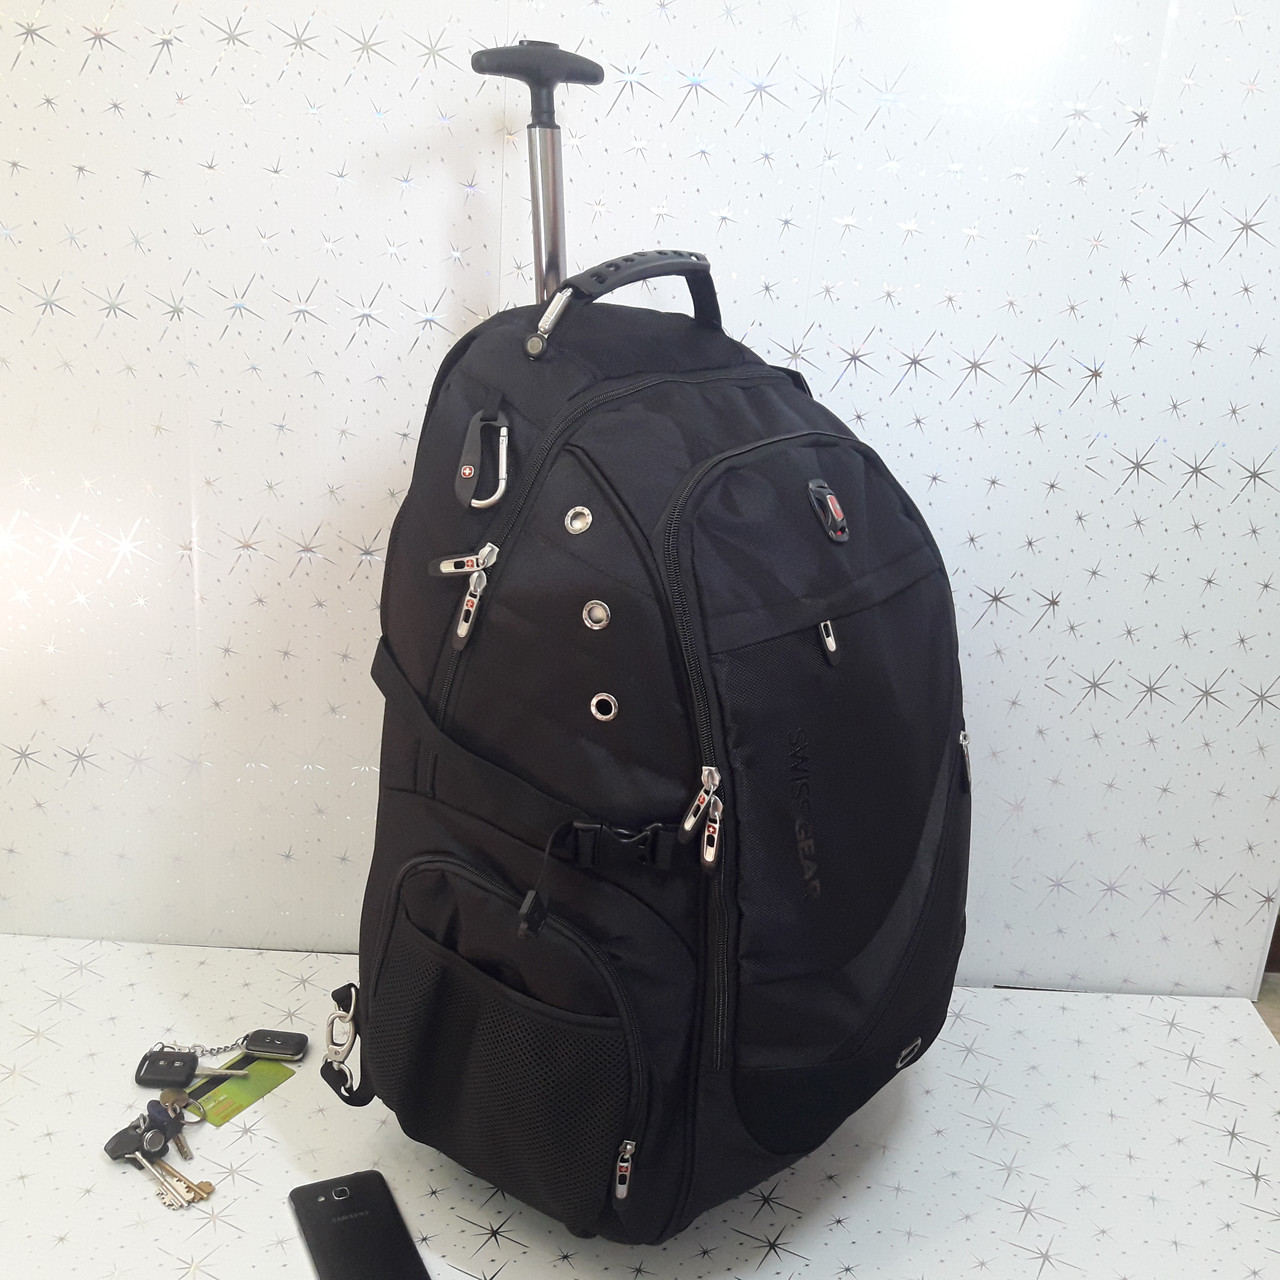 Рюкзак swissgear 1700 дорожная сумка